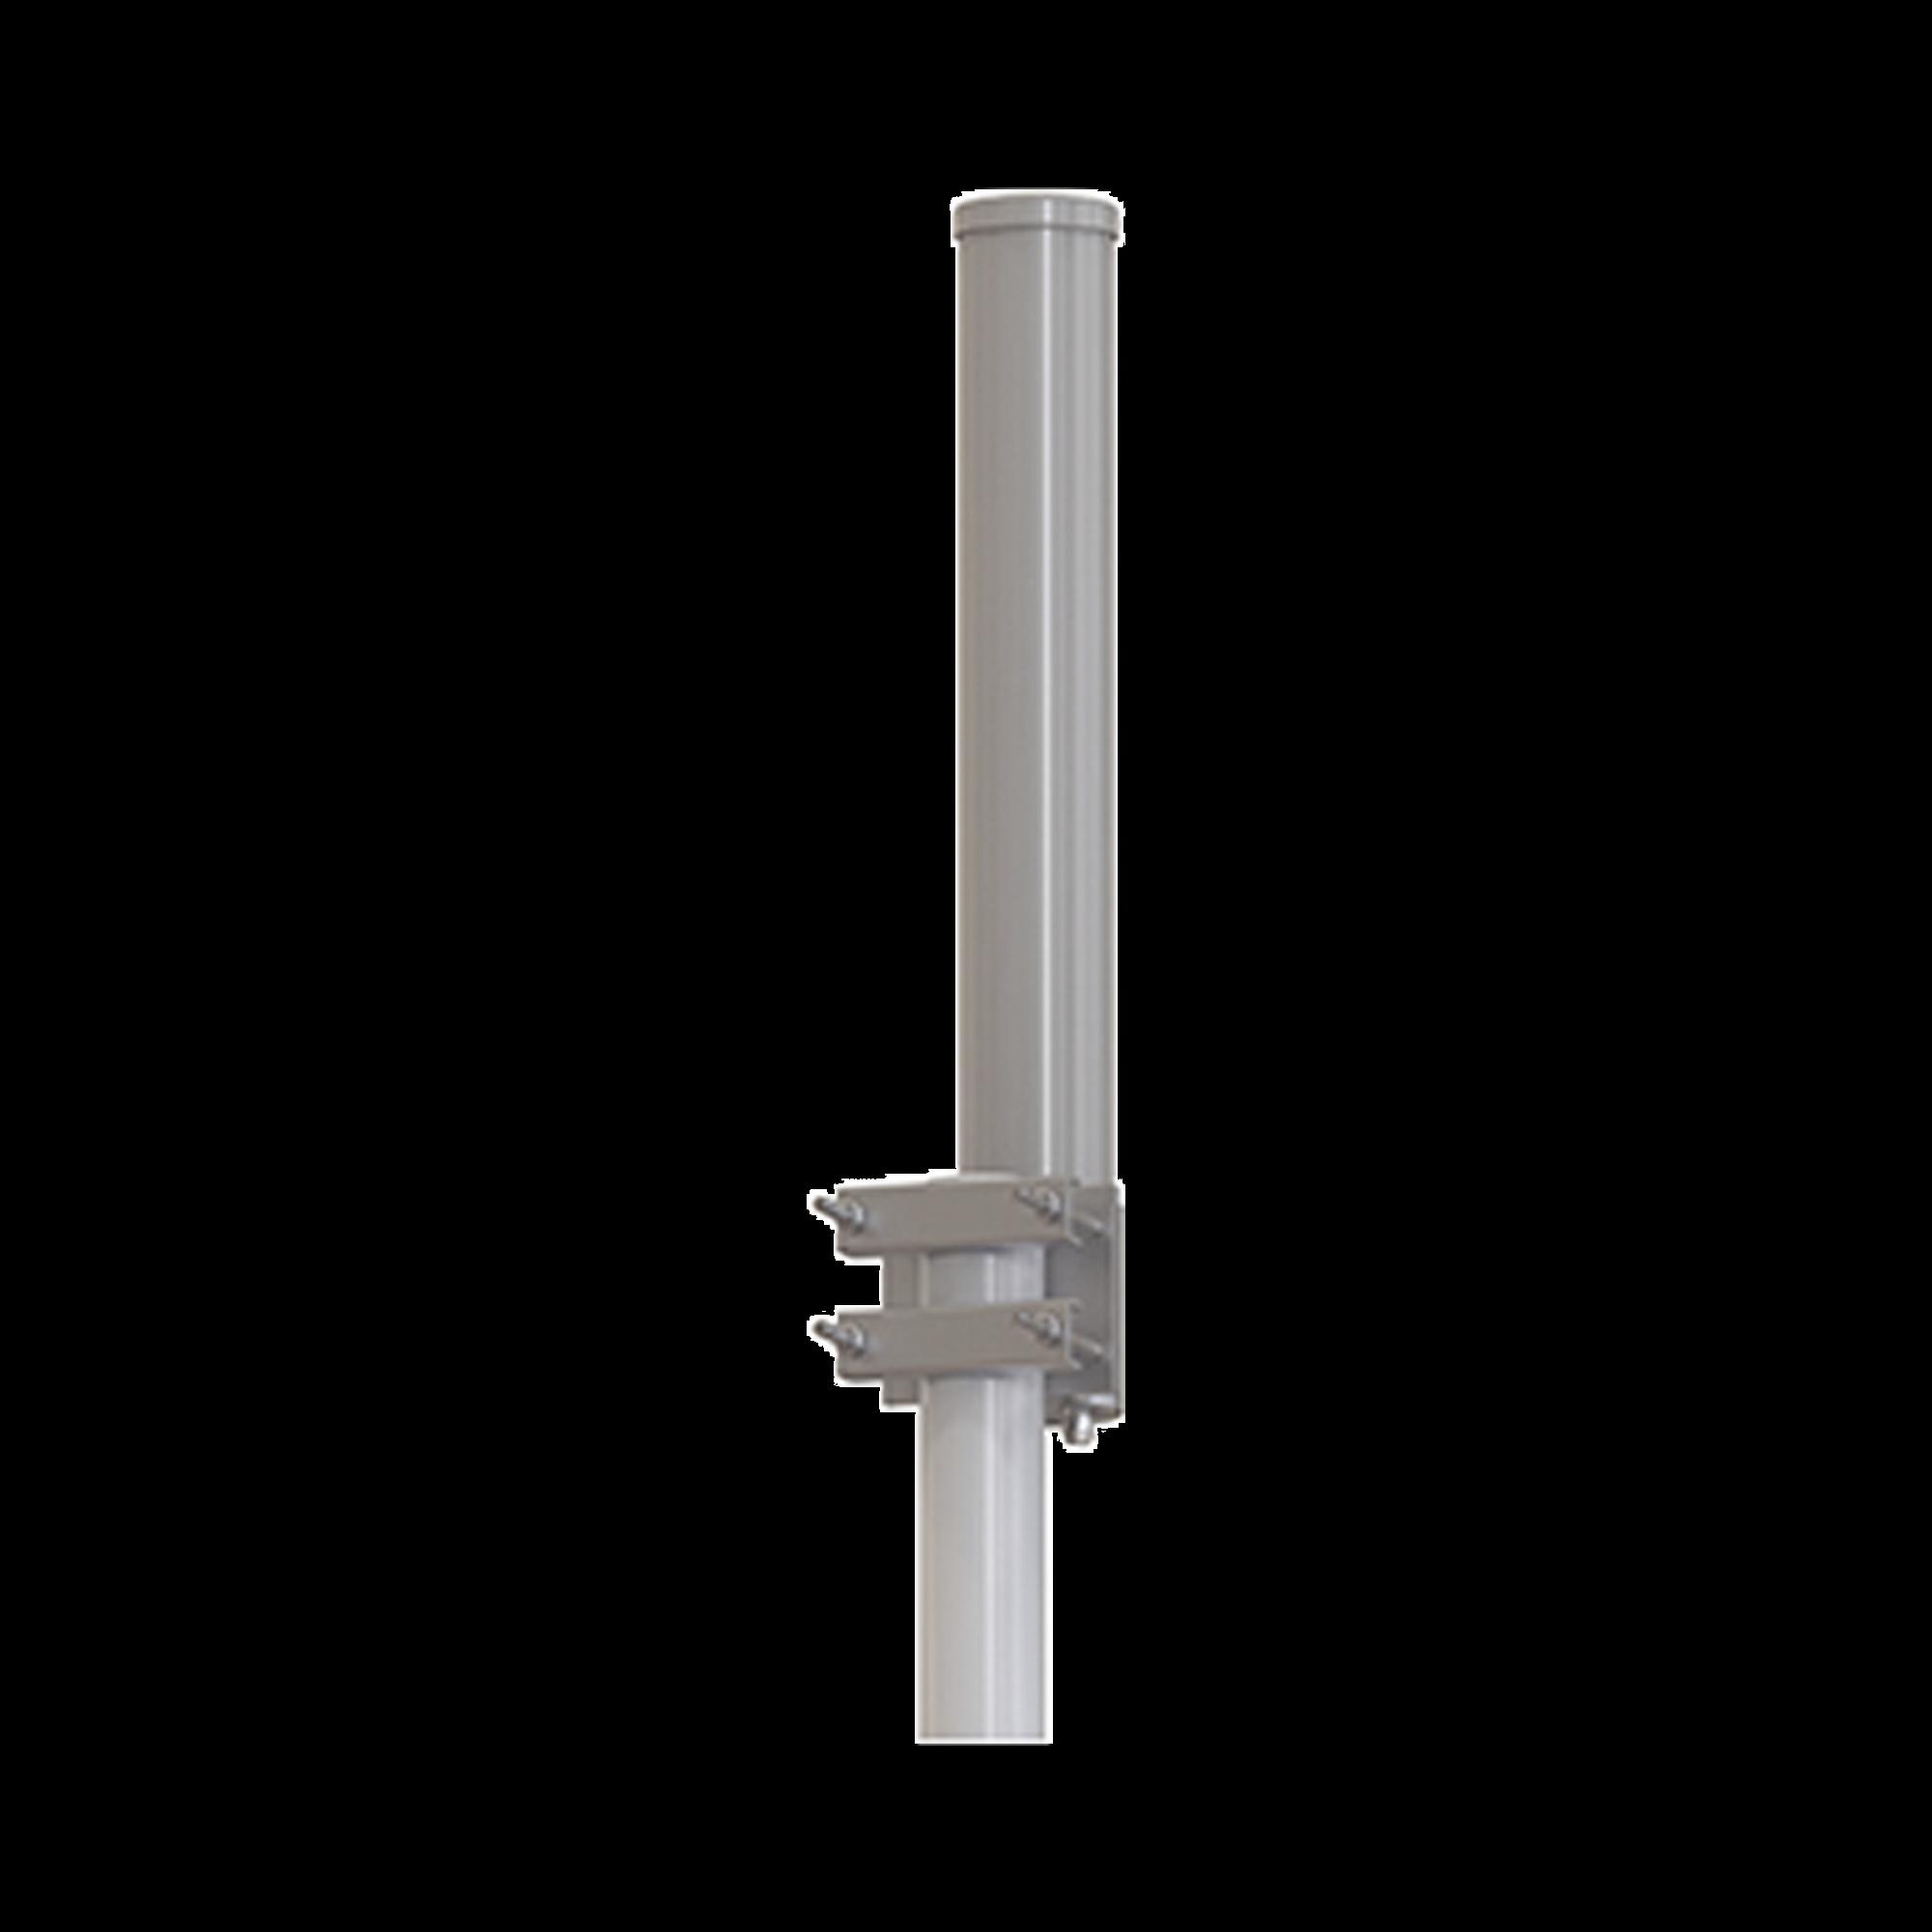 Antena Omnidireccional 5.1 - 5.8 GHz Ganancia 13 dBi, , incluye jumpers con conetor N-Hembra a SMA macho inverso, Dimensiones 8.4 x 60 cm / Peso 2 kg